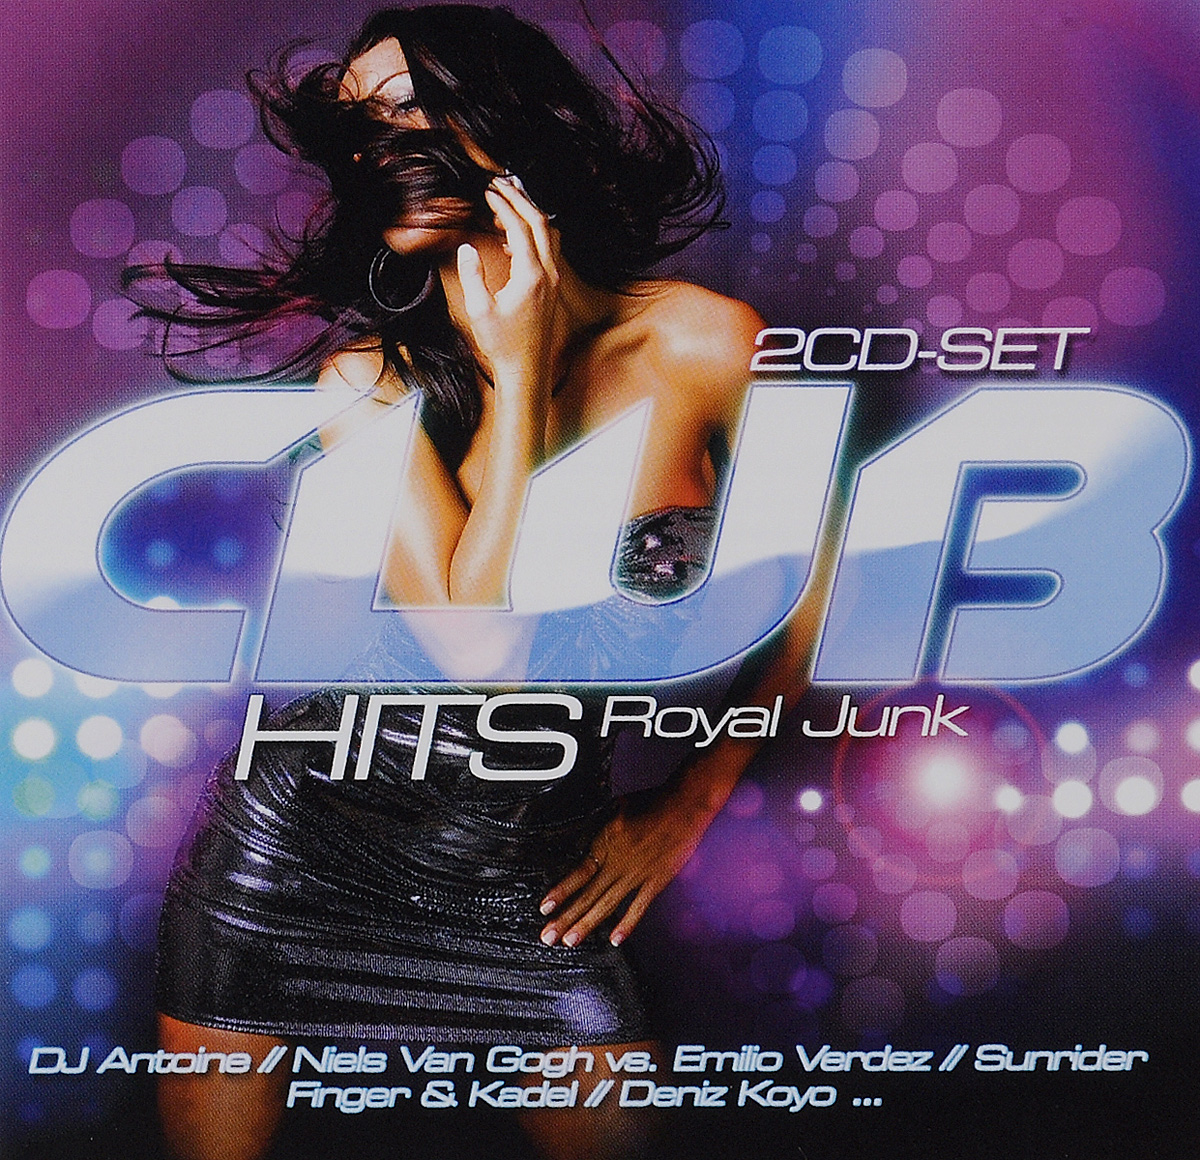 DJ Antoine Club Hits Royal Junk (2 CD) nr 1 club hits best of dance & techno 2 cd